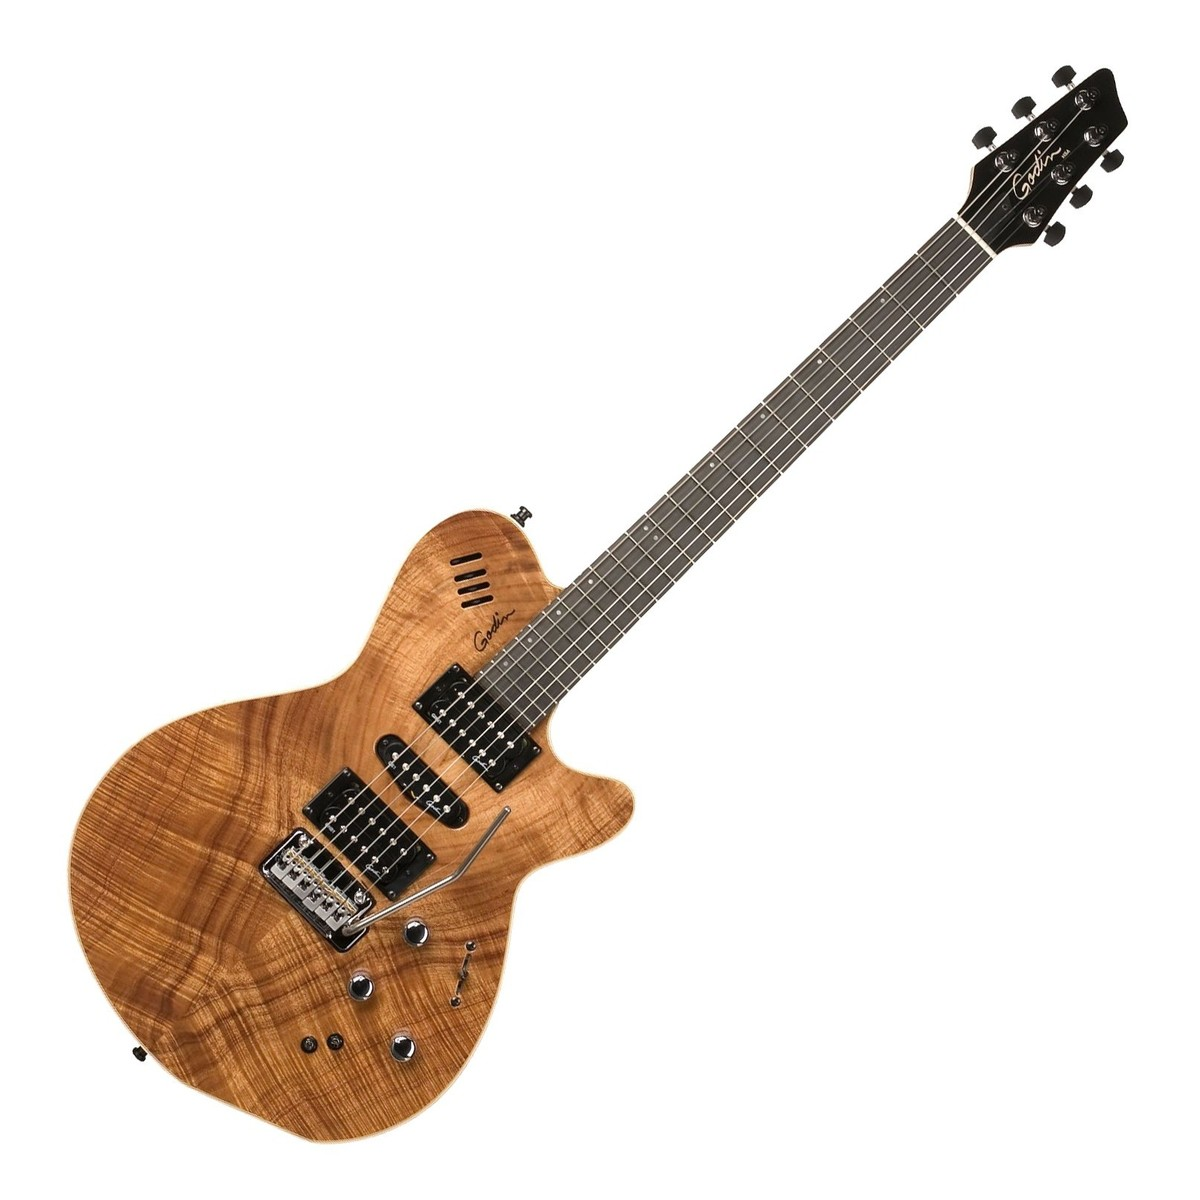 Godin Xtsa Guitarra El 233 Ctrica Koa B Stock Gear4music